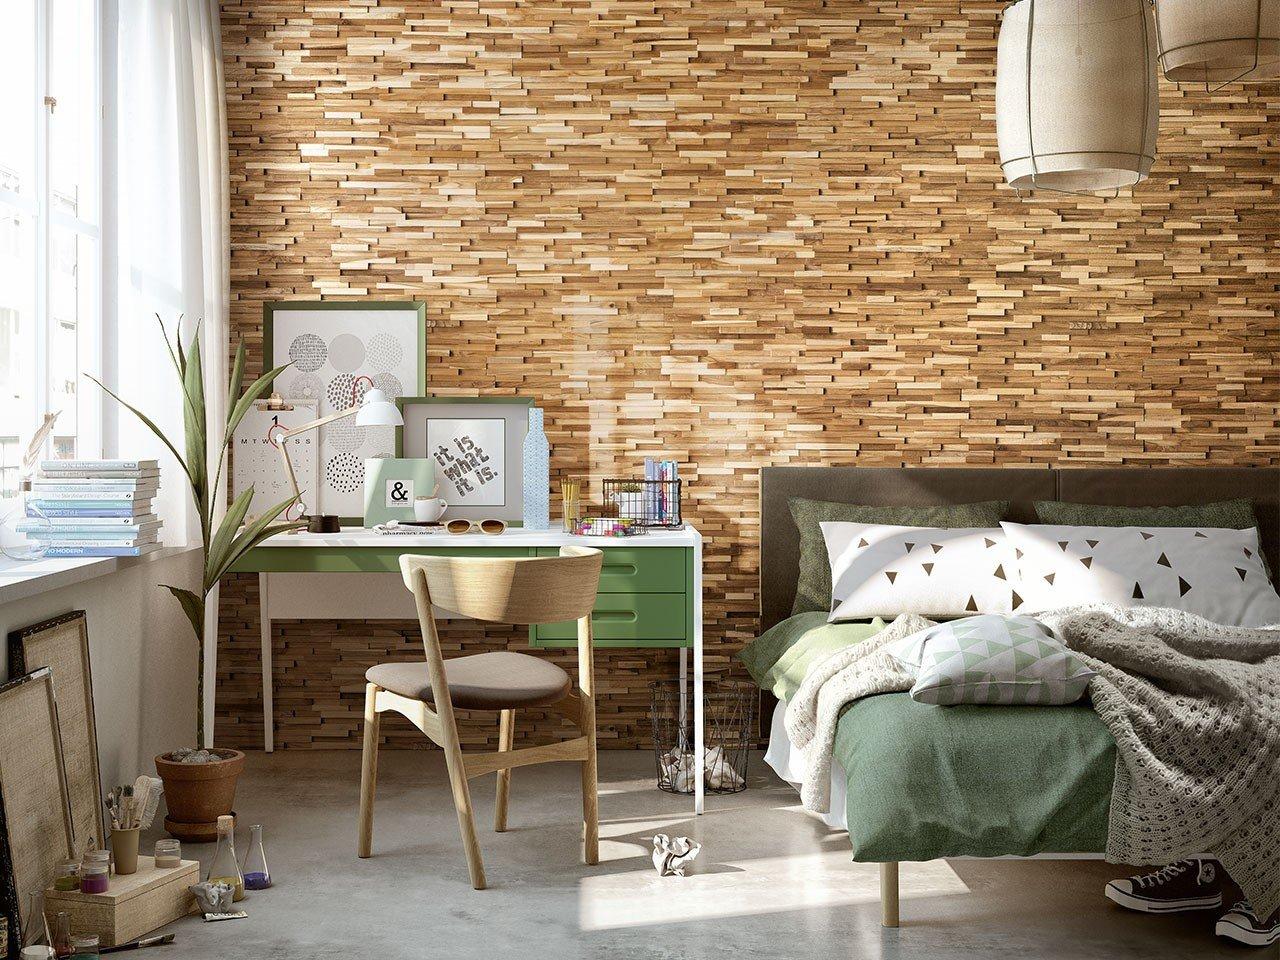 Rivestimento in legno naturale wonderwood natural iperceramica - Rivestimento in legno per bagno ...